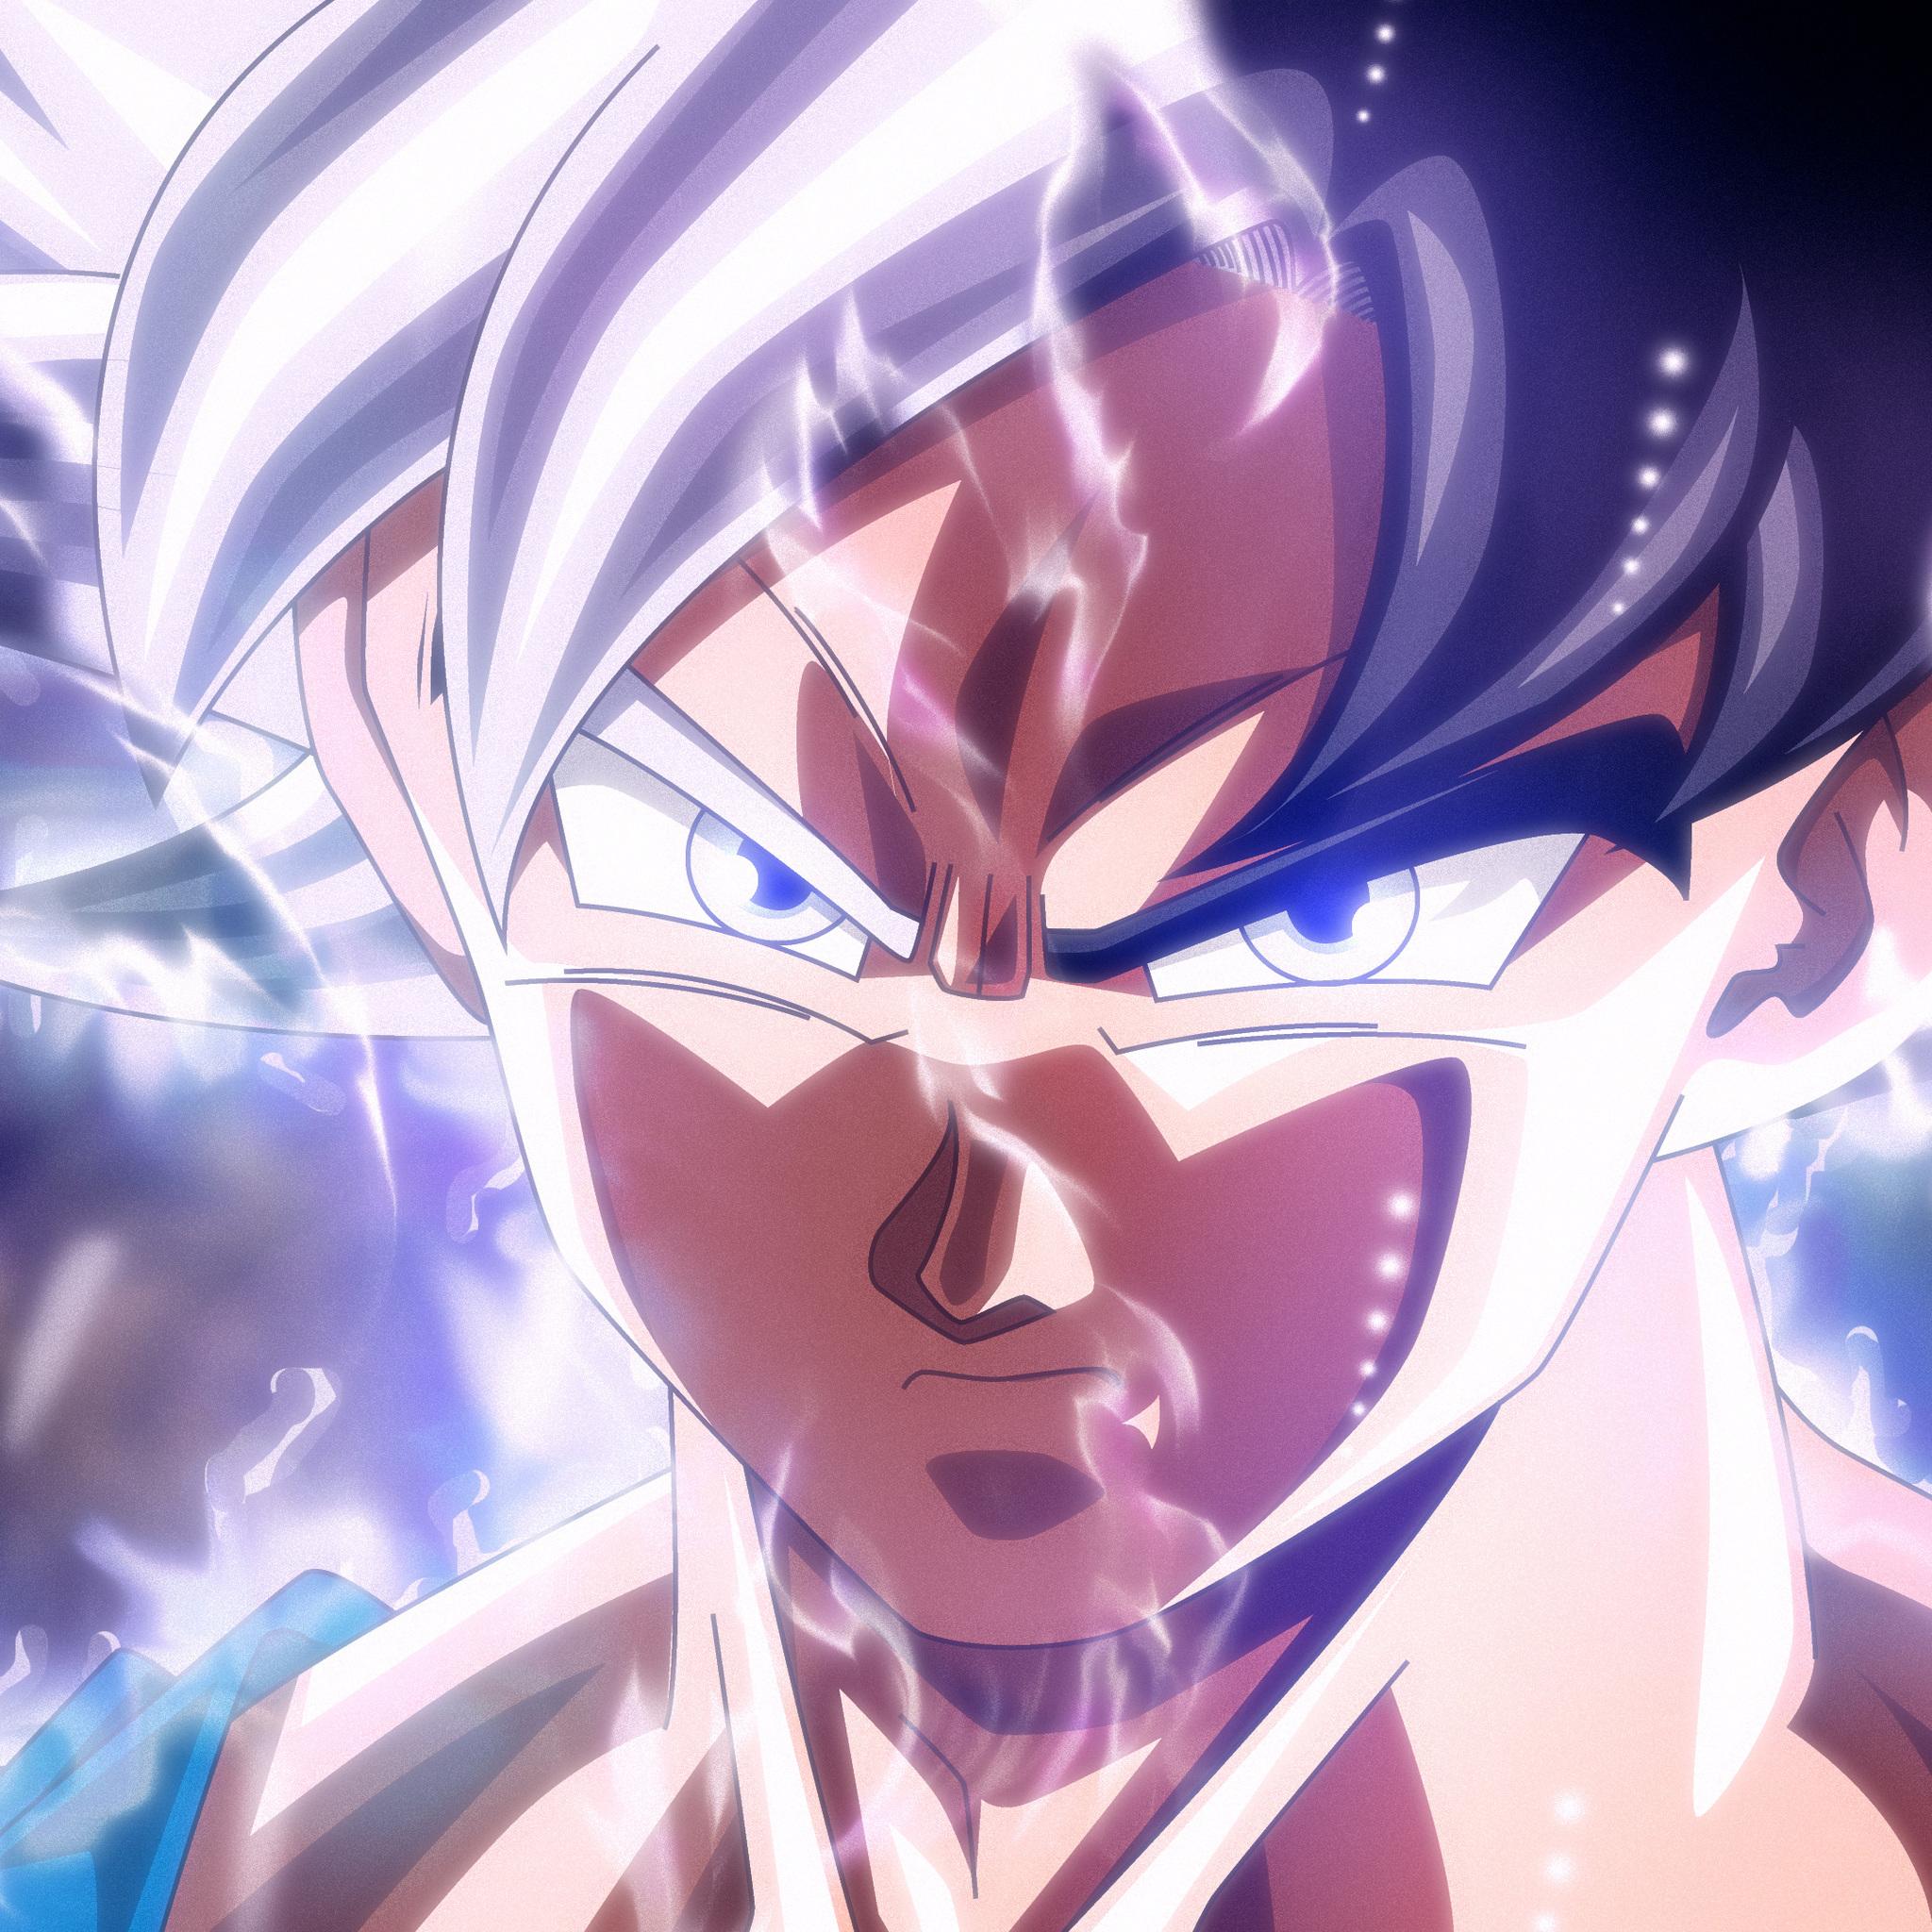 Ultra Instinct Dragon Ball Super Wallpaper: 2048x2048 Son Goku Mastered Ultra Instinct Ipad Air HD 4k